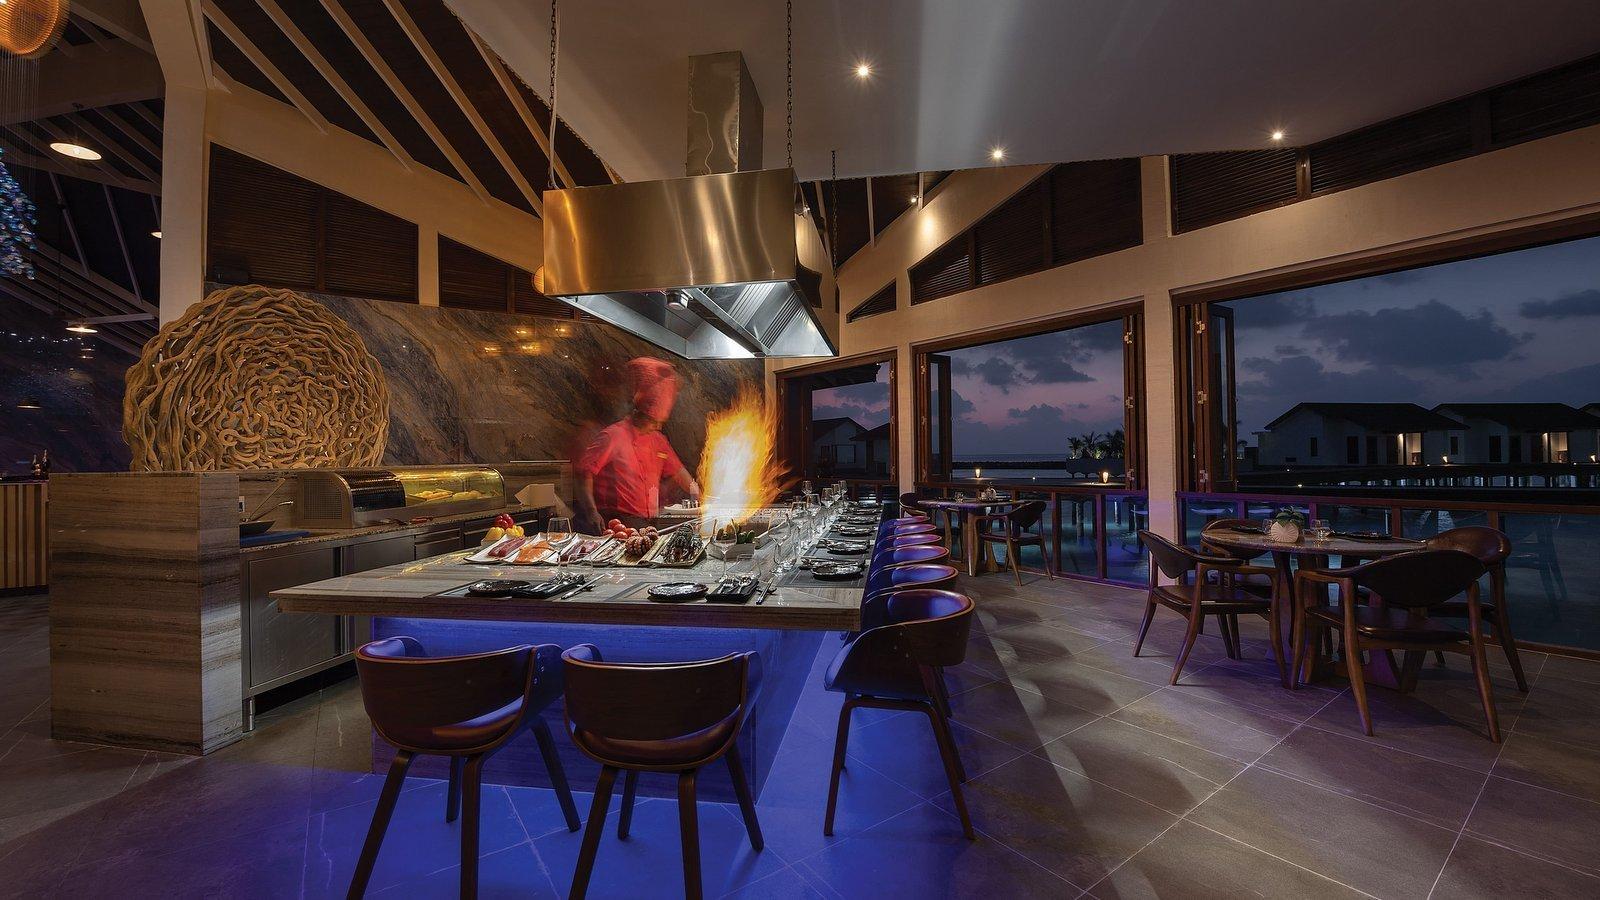 Мальдивы, отель Atmosphere Kanifushi Maldives, ресторан Teppanyaki Grill